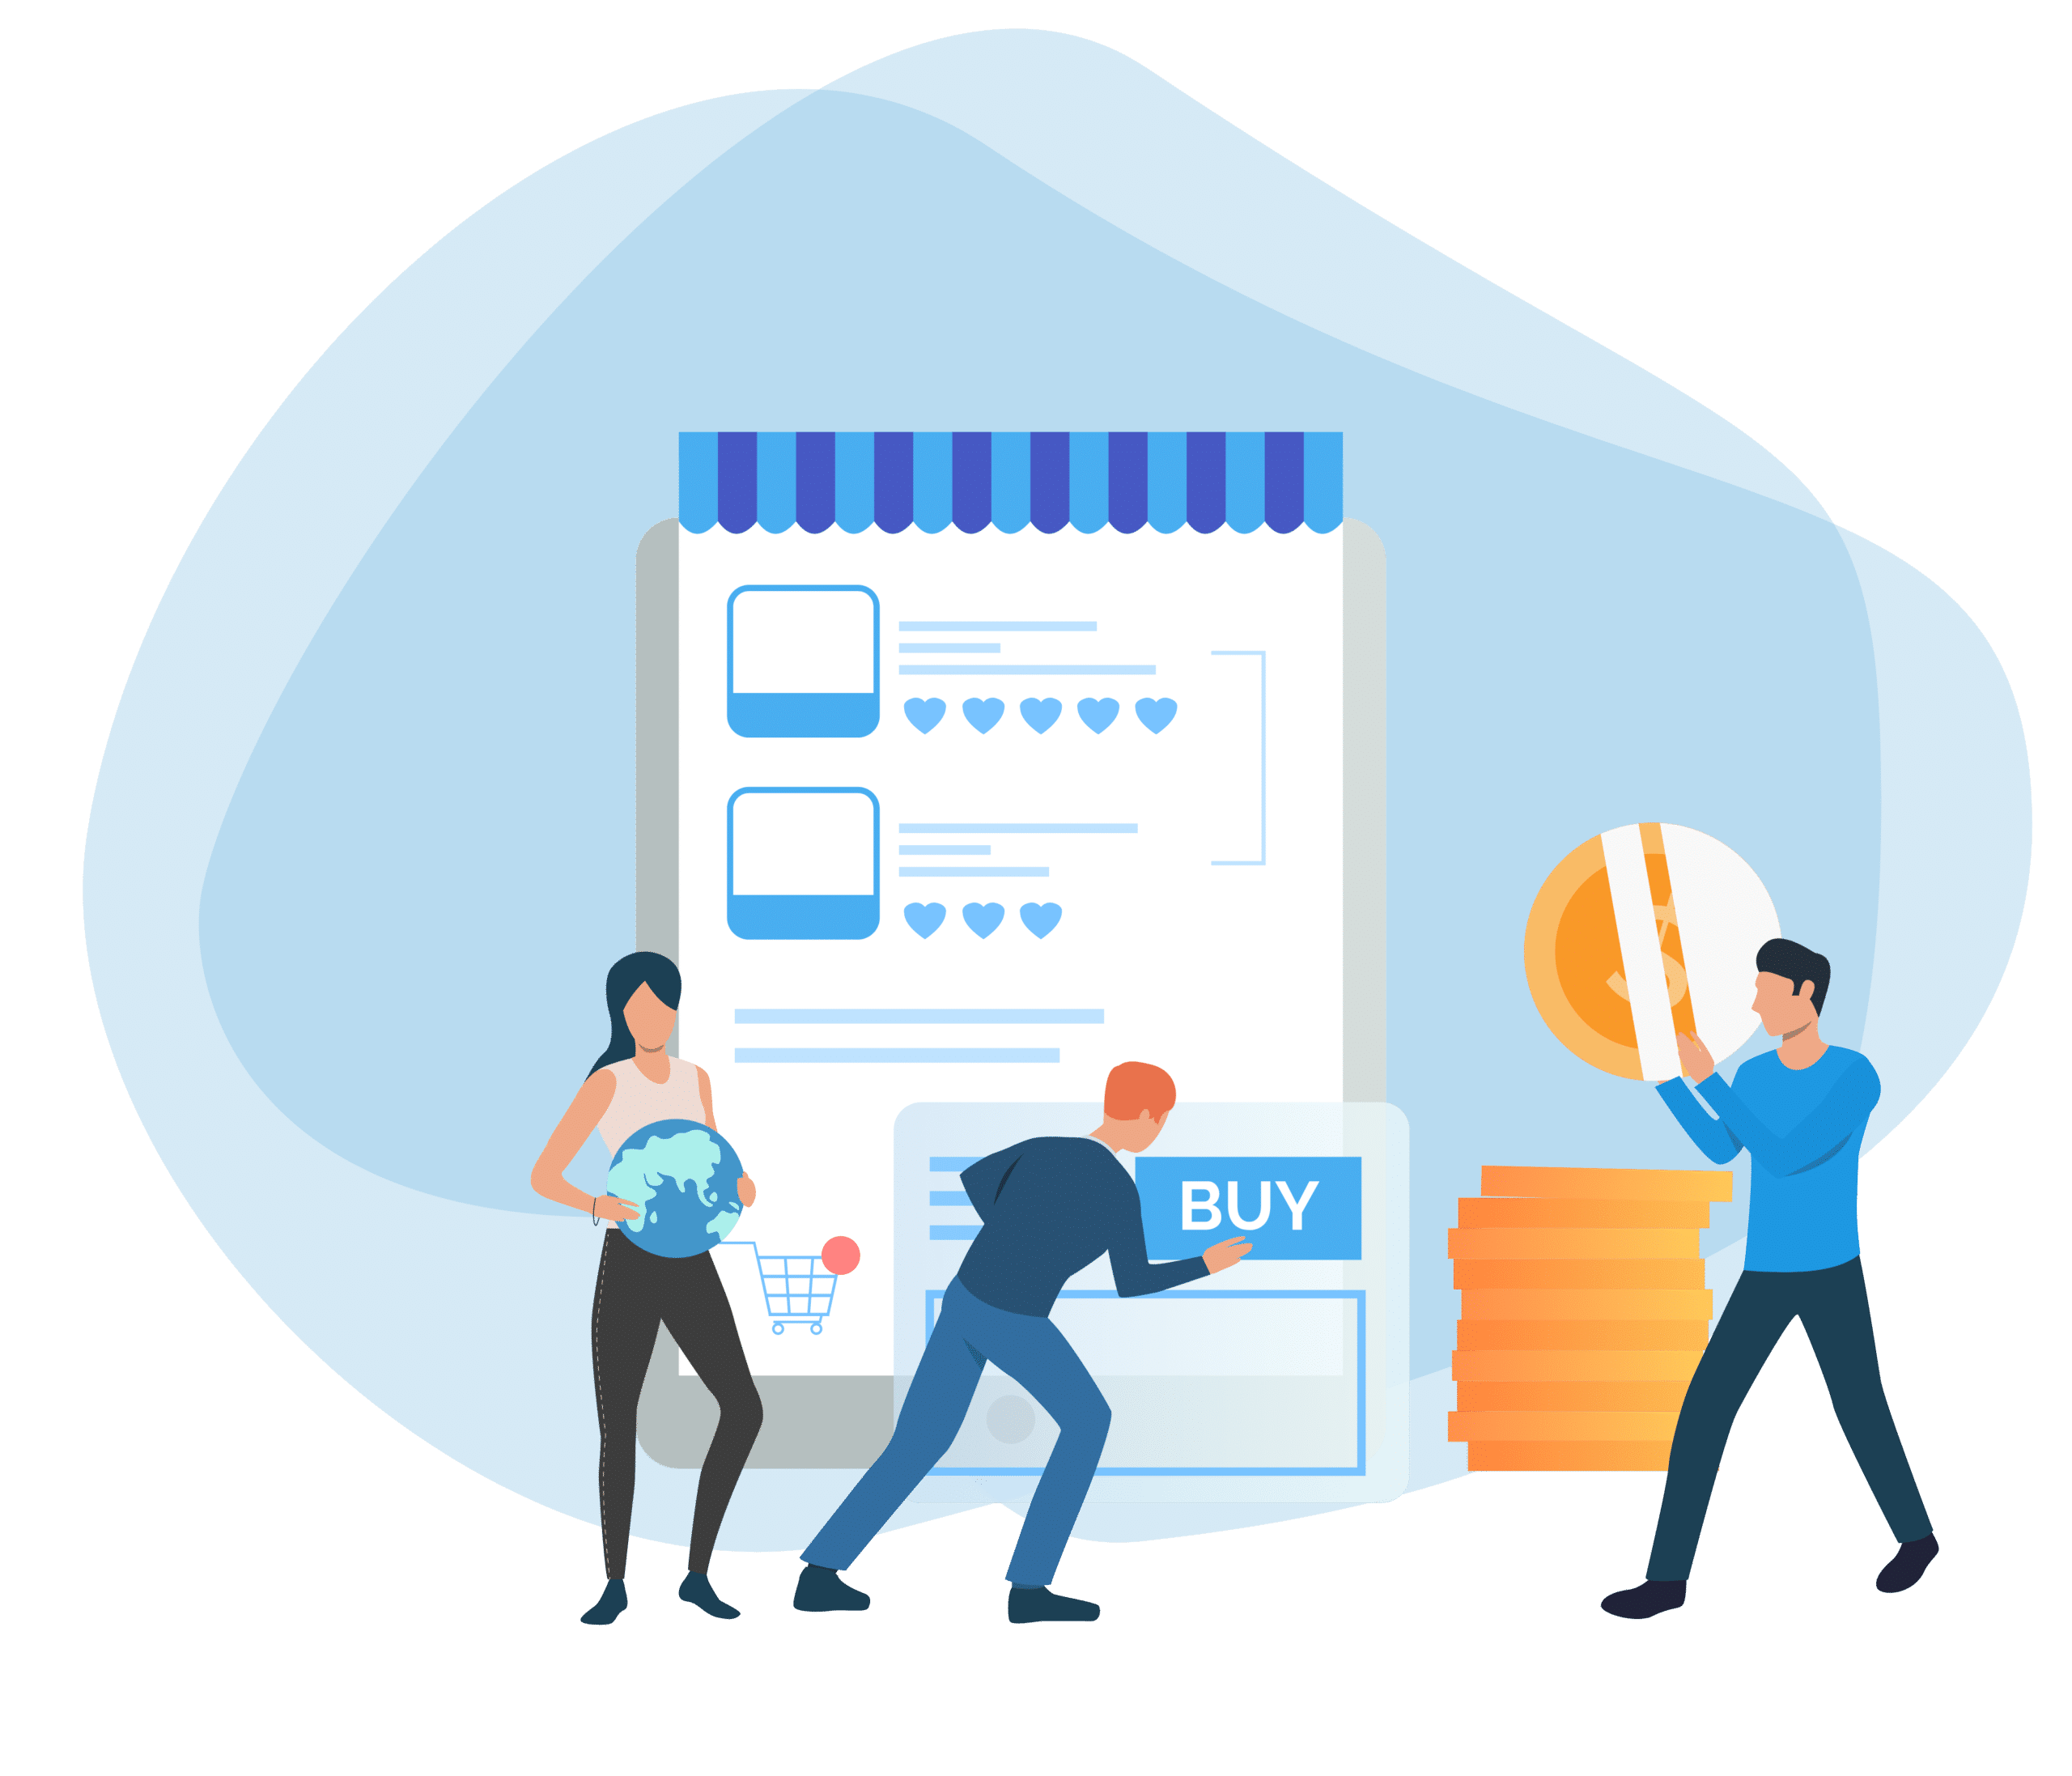 marketplace-website-people